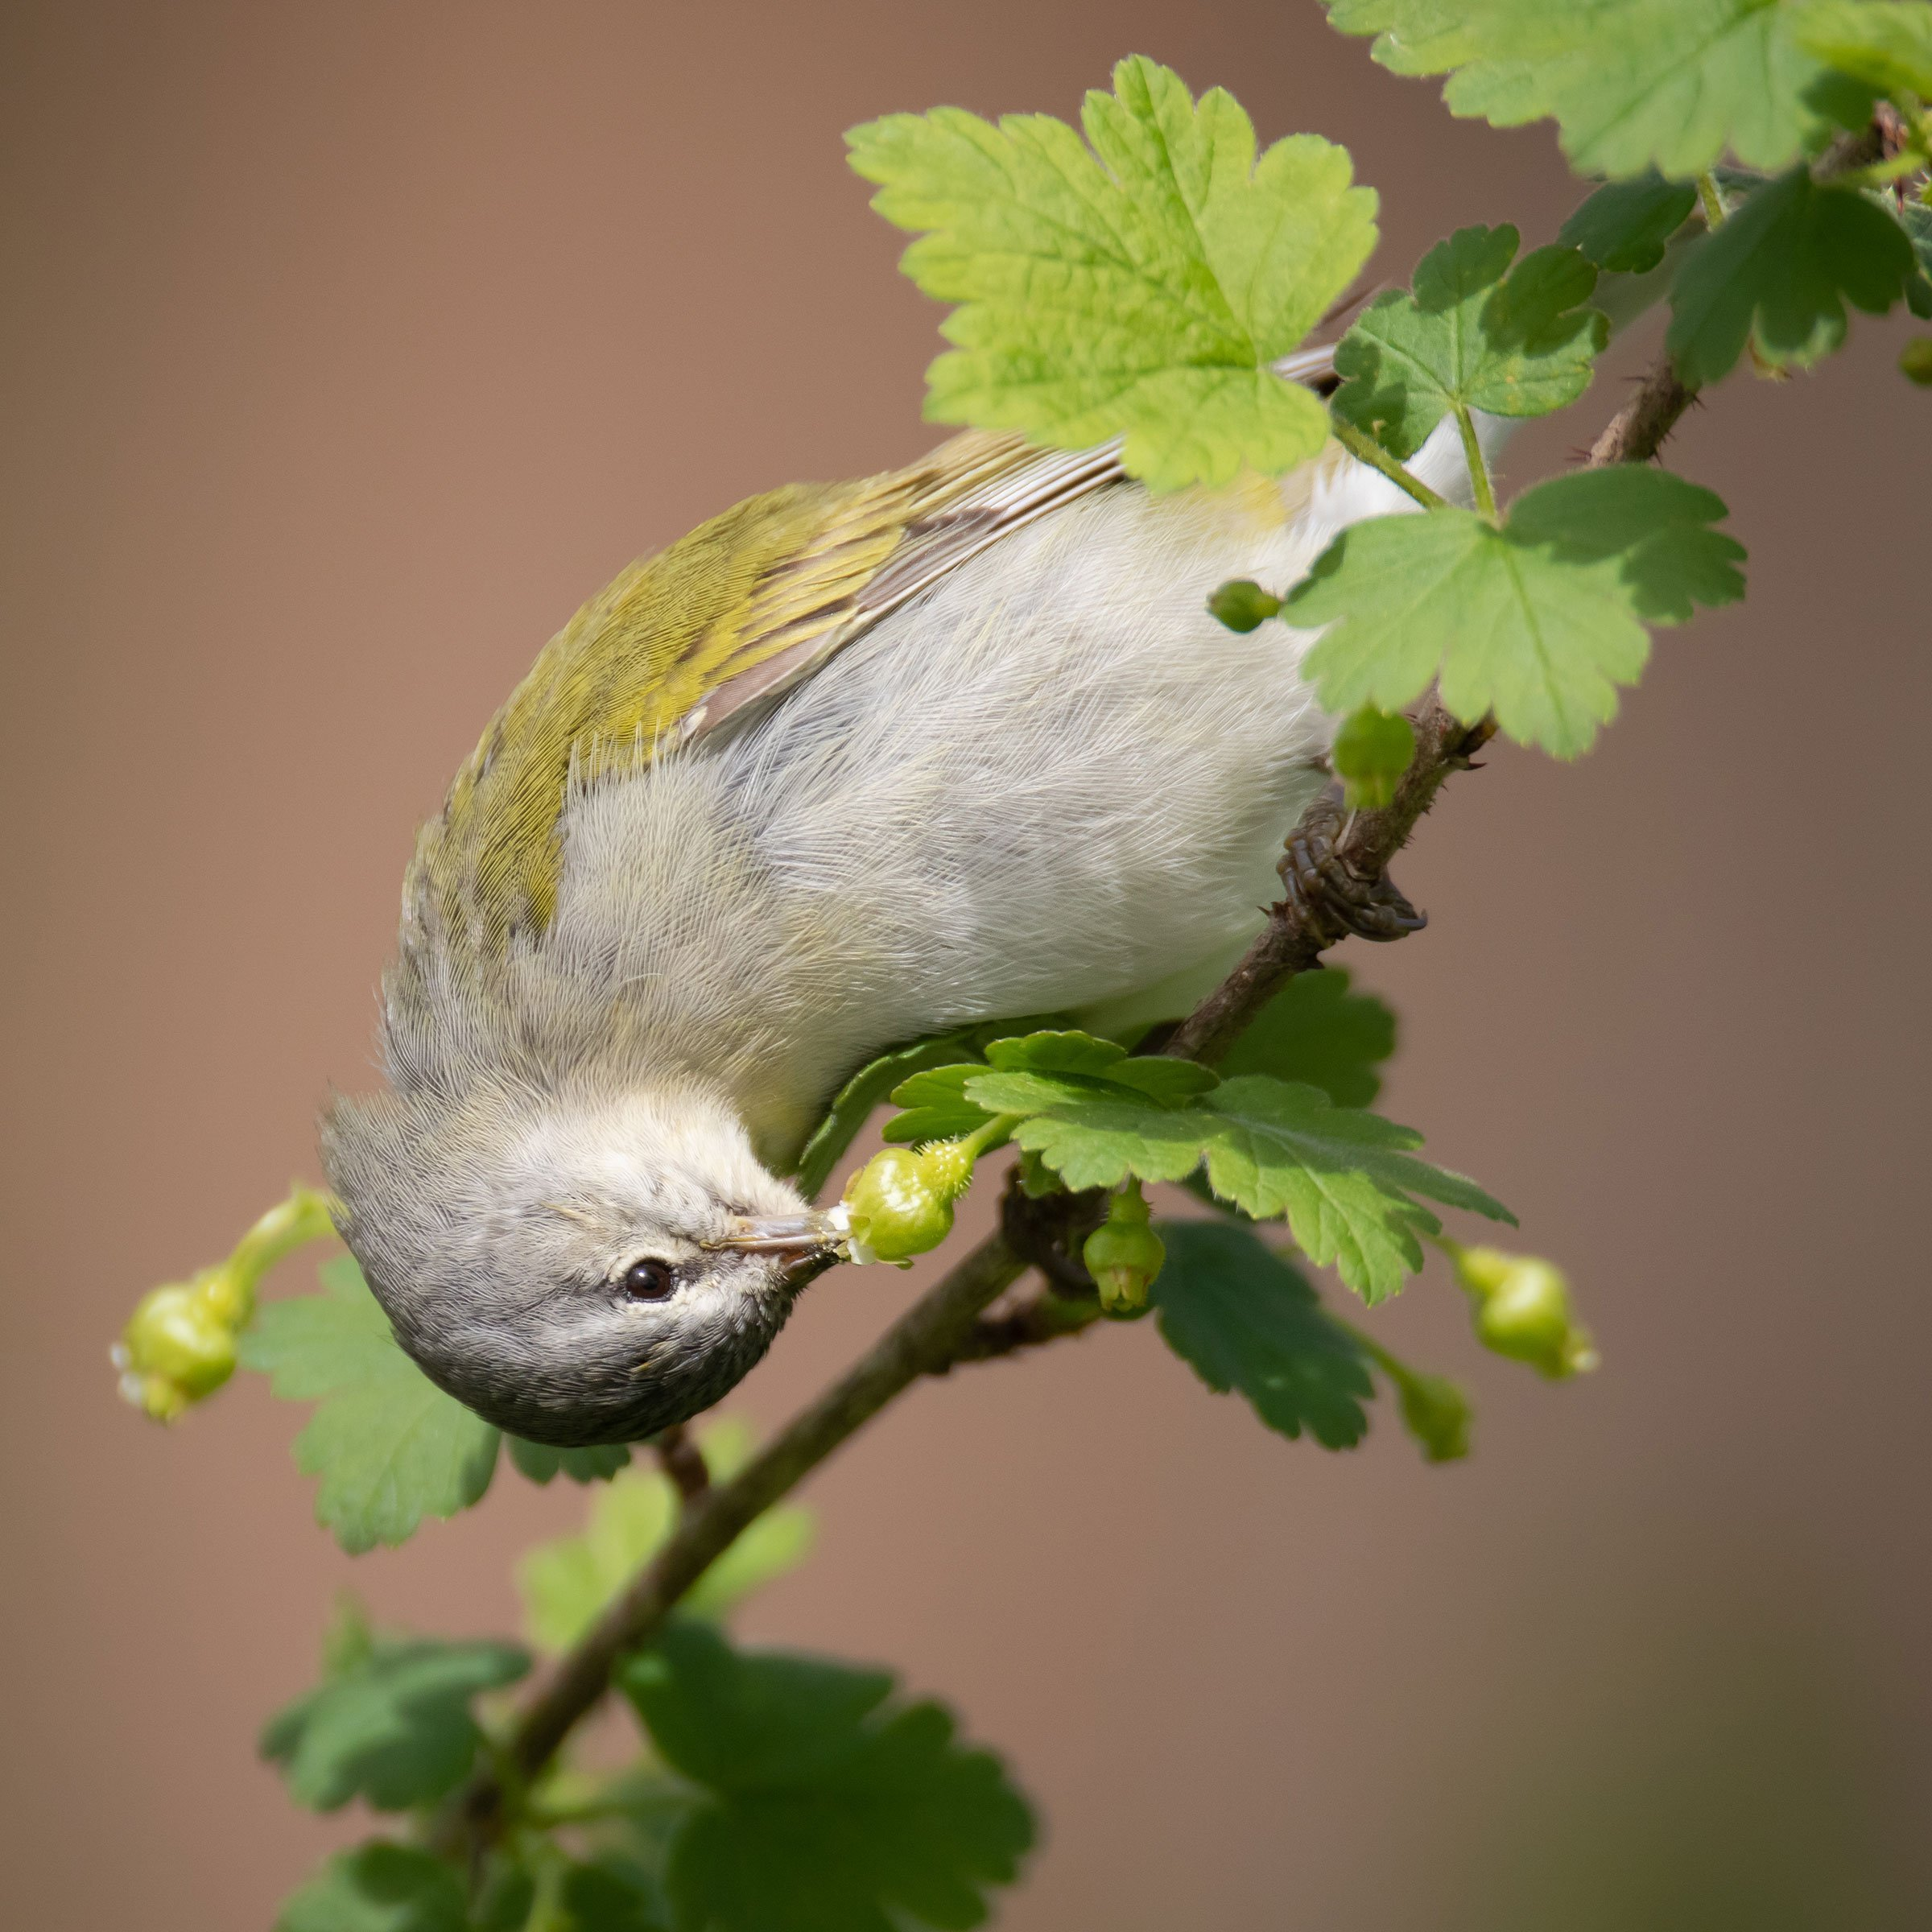 web_006_PfB_02_Tennessee-Warbler-_Natalie-Robertson_tennesseewarbler_plantsforbirds_highres